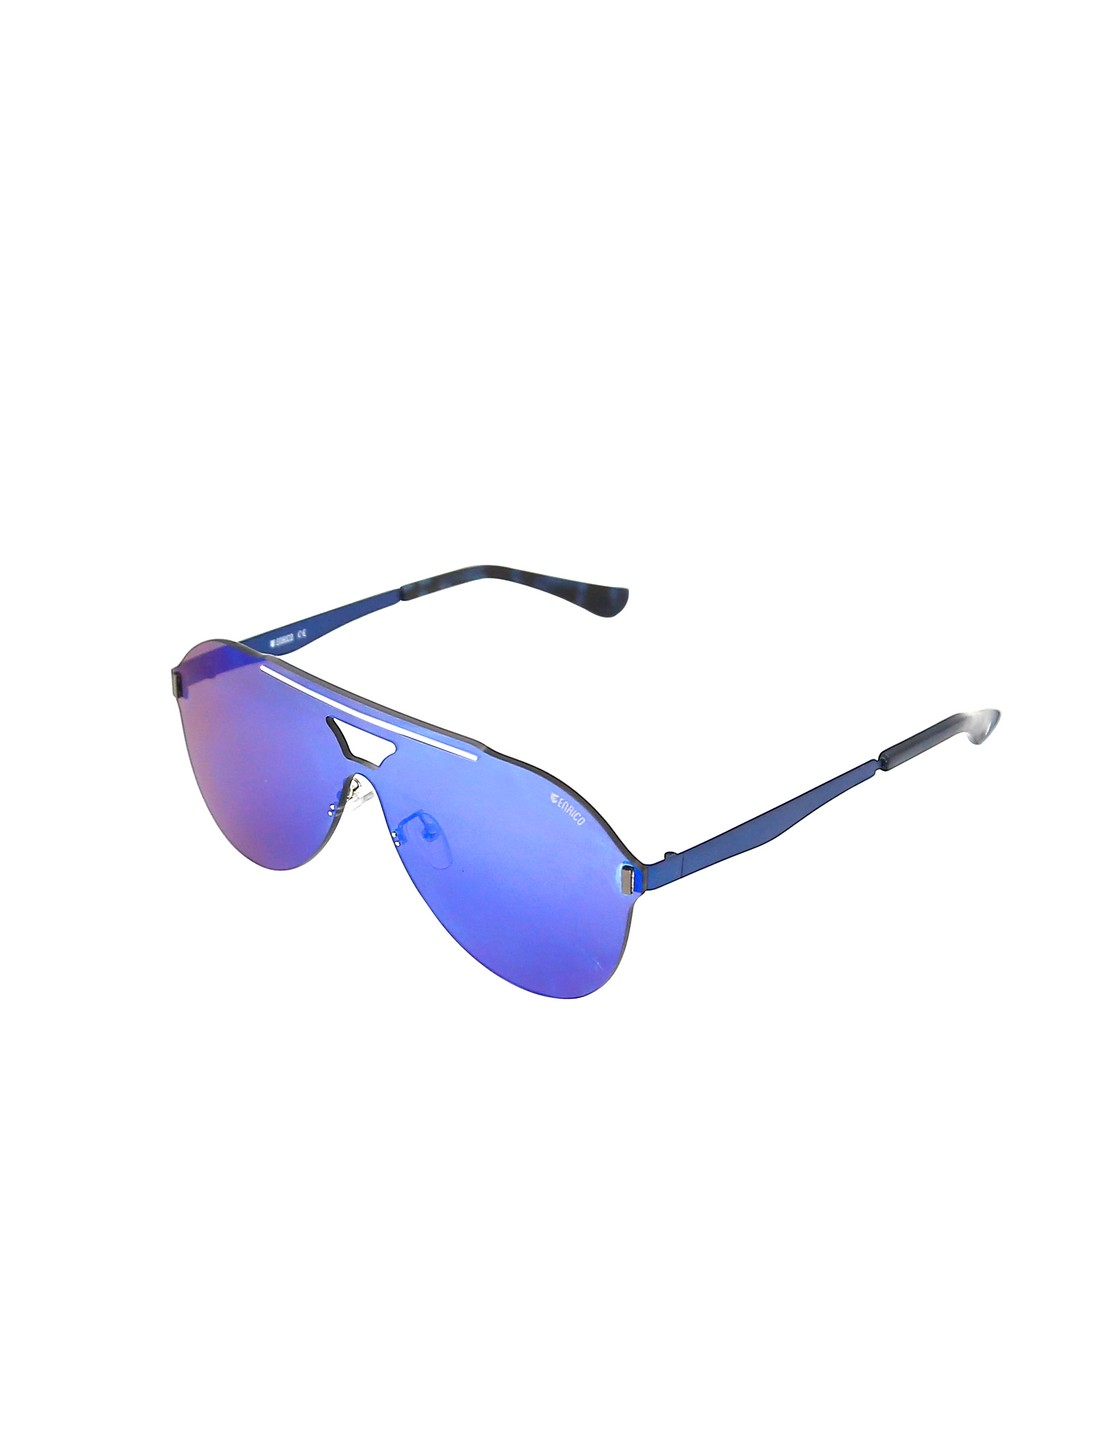 ENRICO | ENRICO Mask UV Protected Aviator Sunglasses for Men ( Lens - Blue | Frame - Blue)